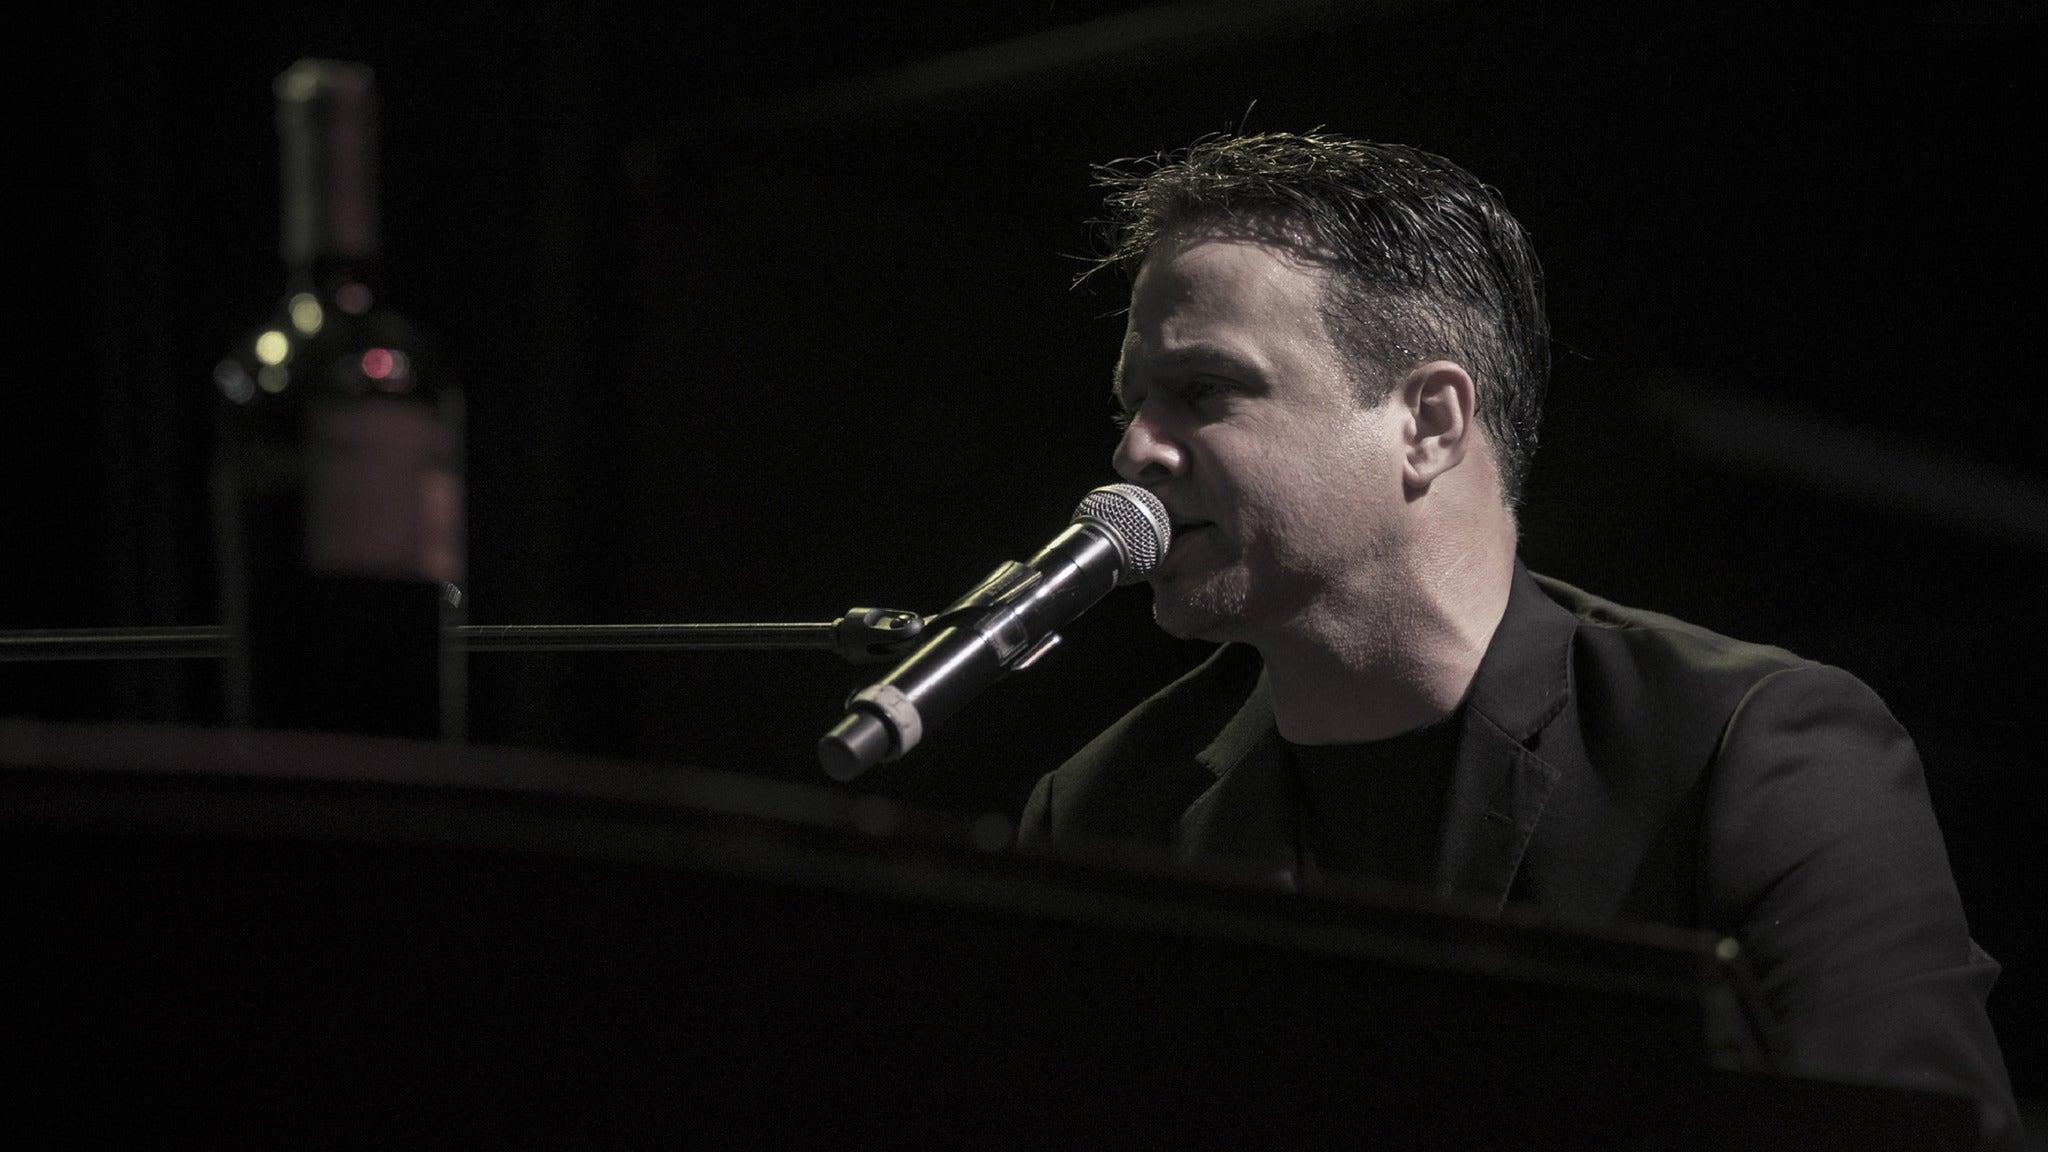 The Stranger - A Billy Joel Tribute